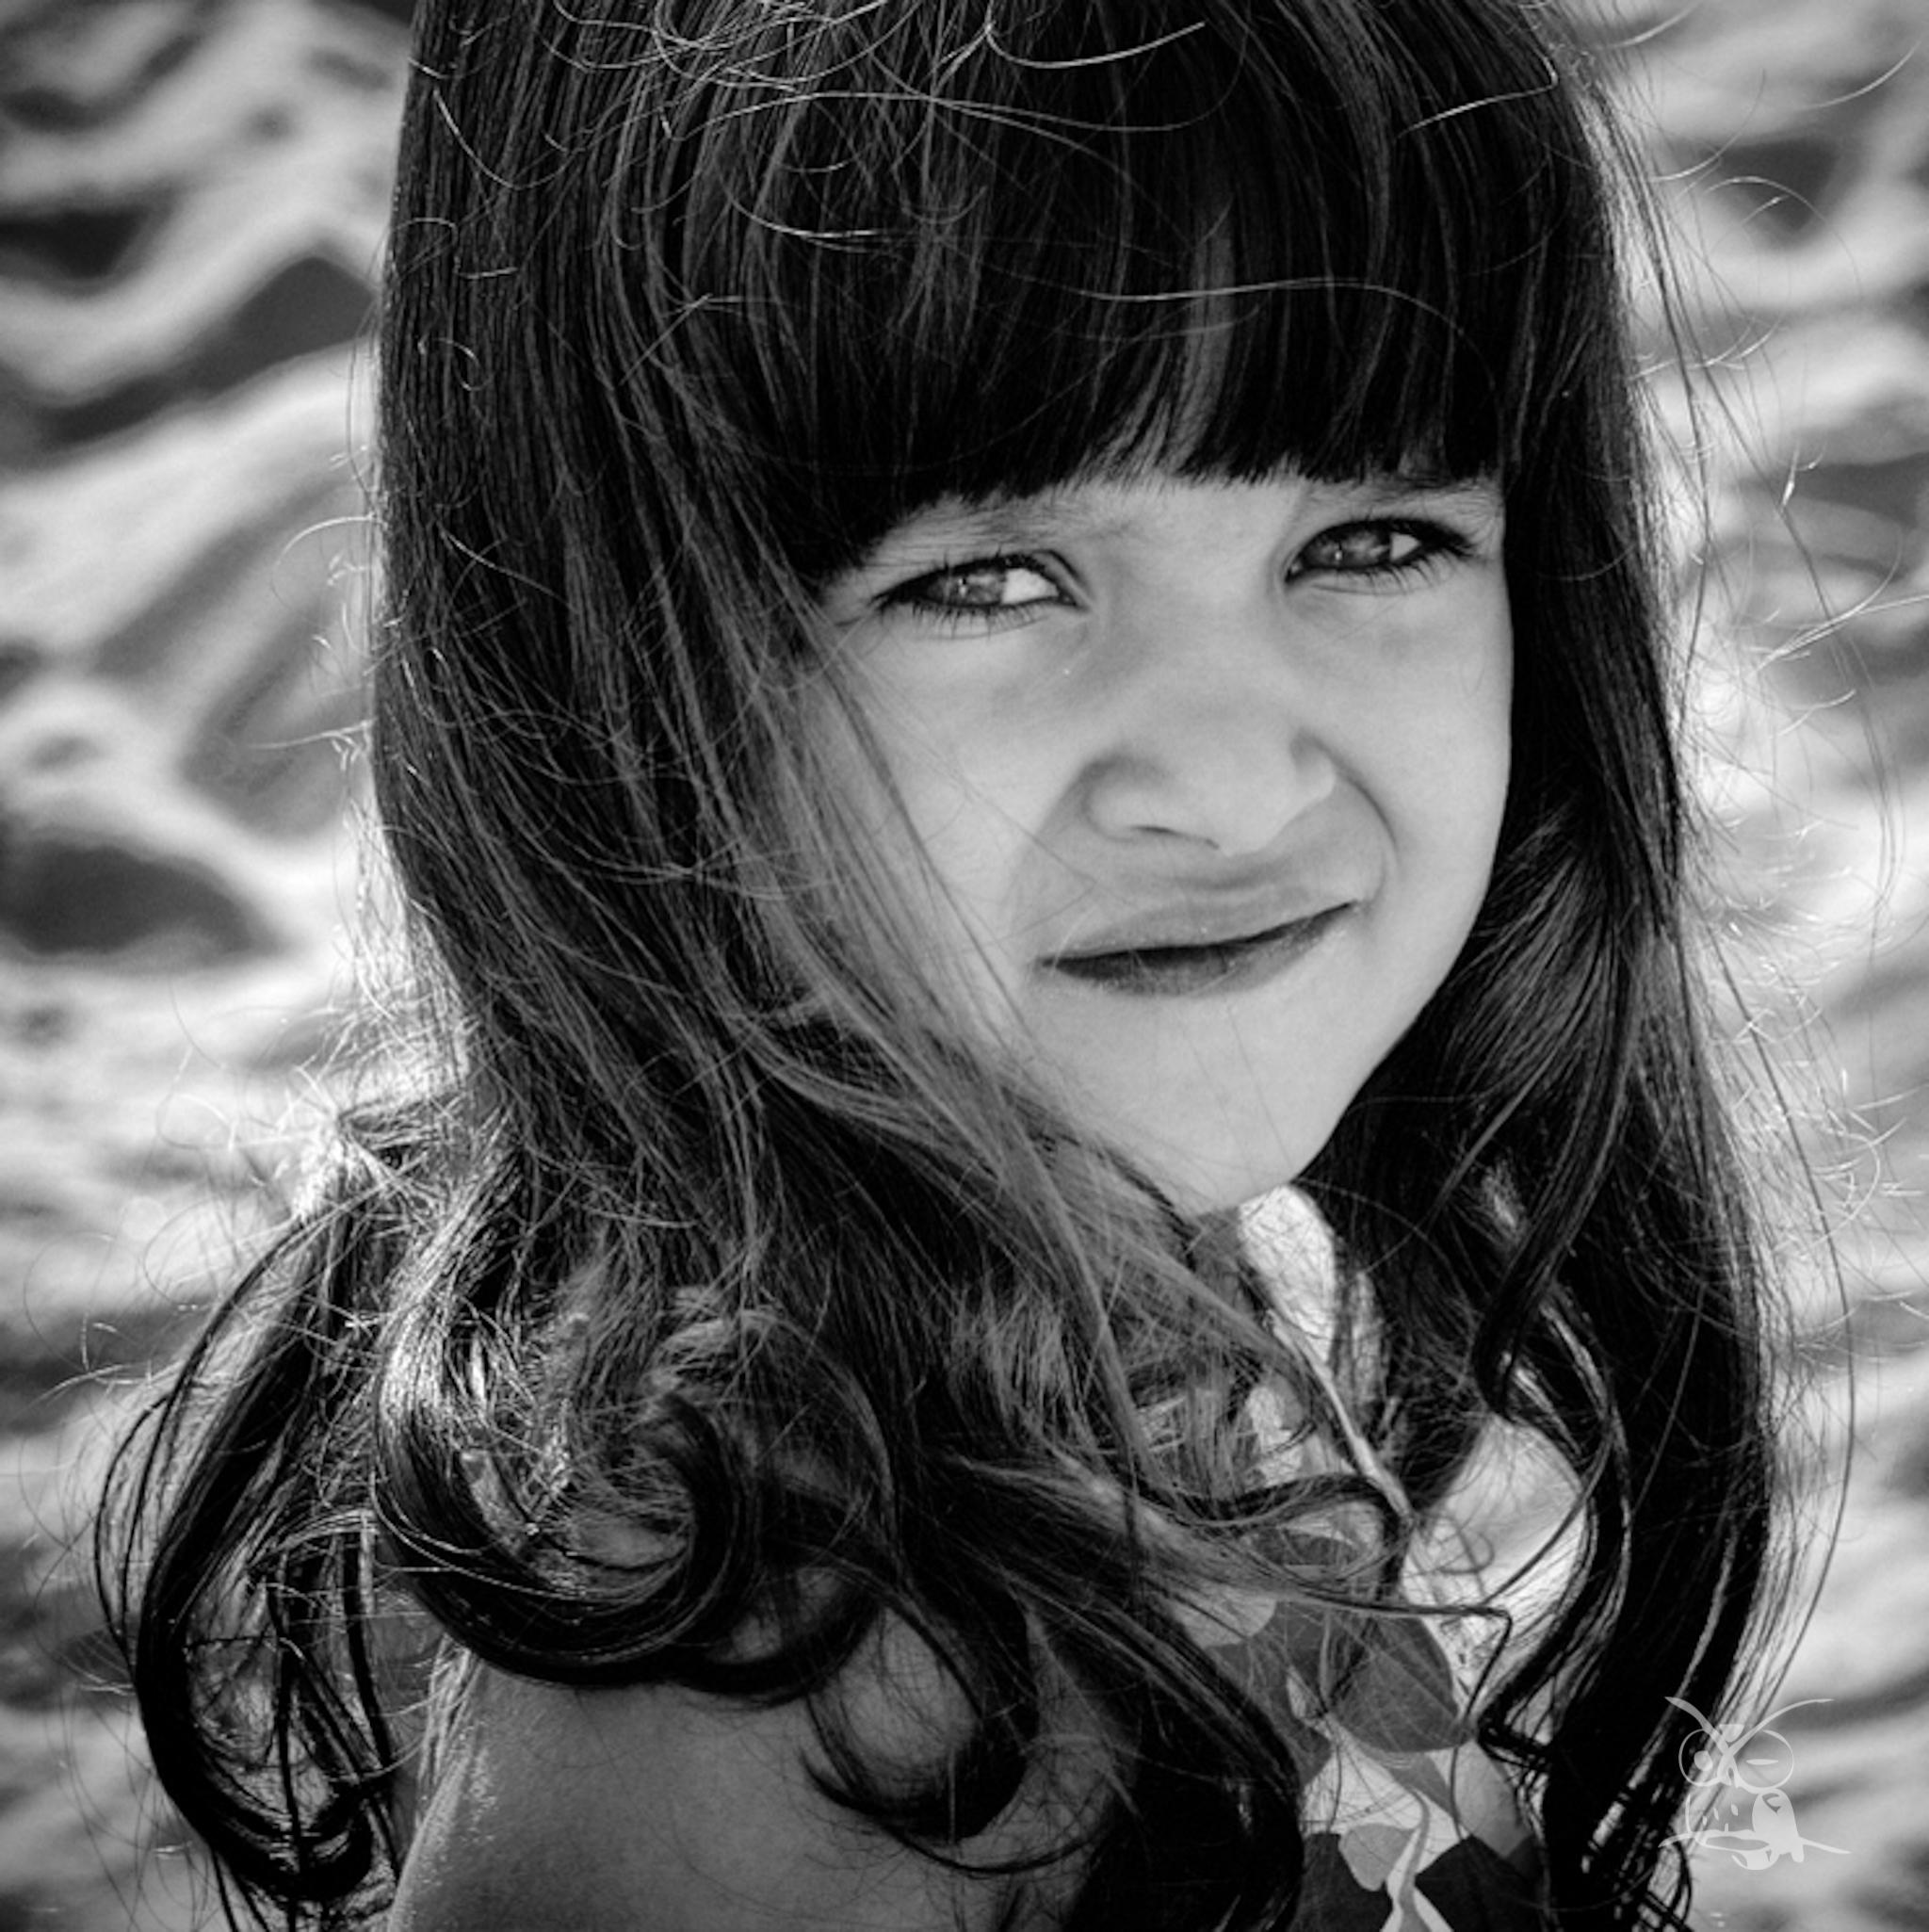 Kind Portrait